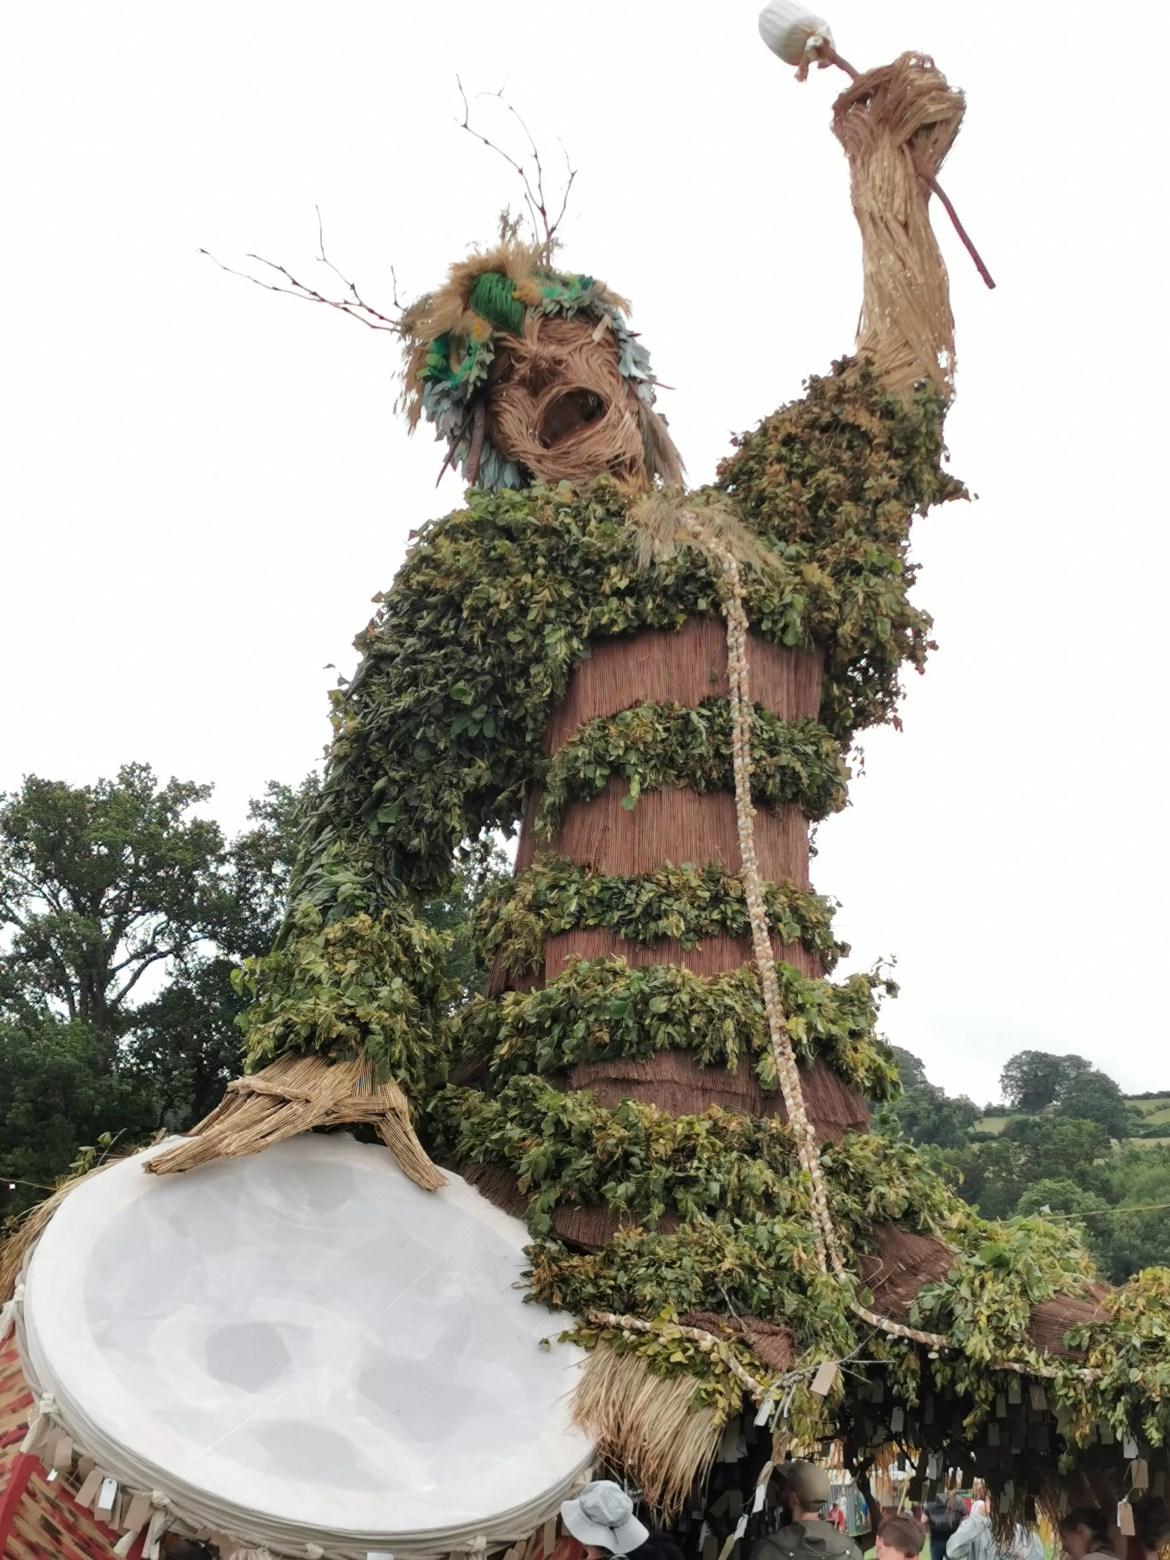 FESTIVAL REPORT: Green Man 2019